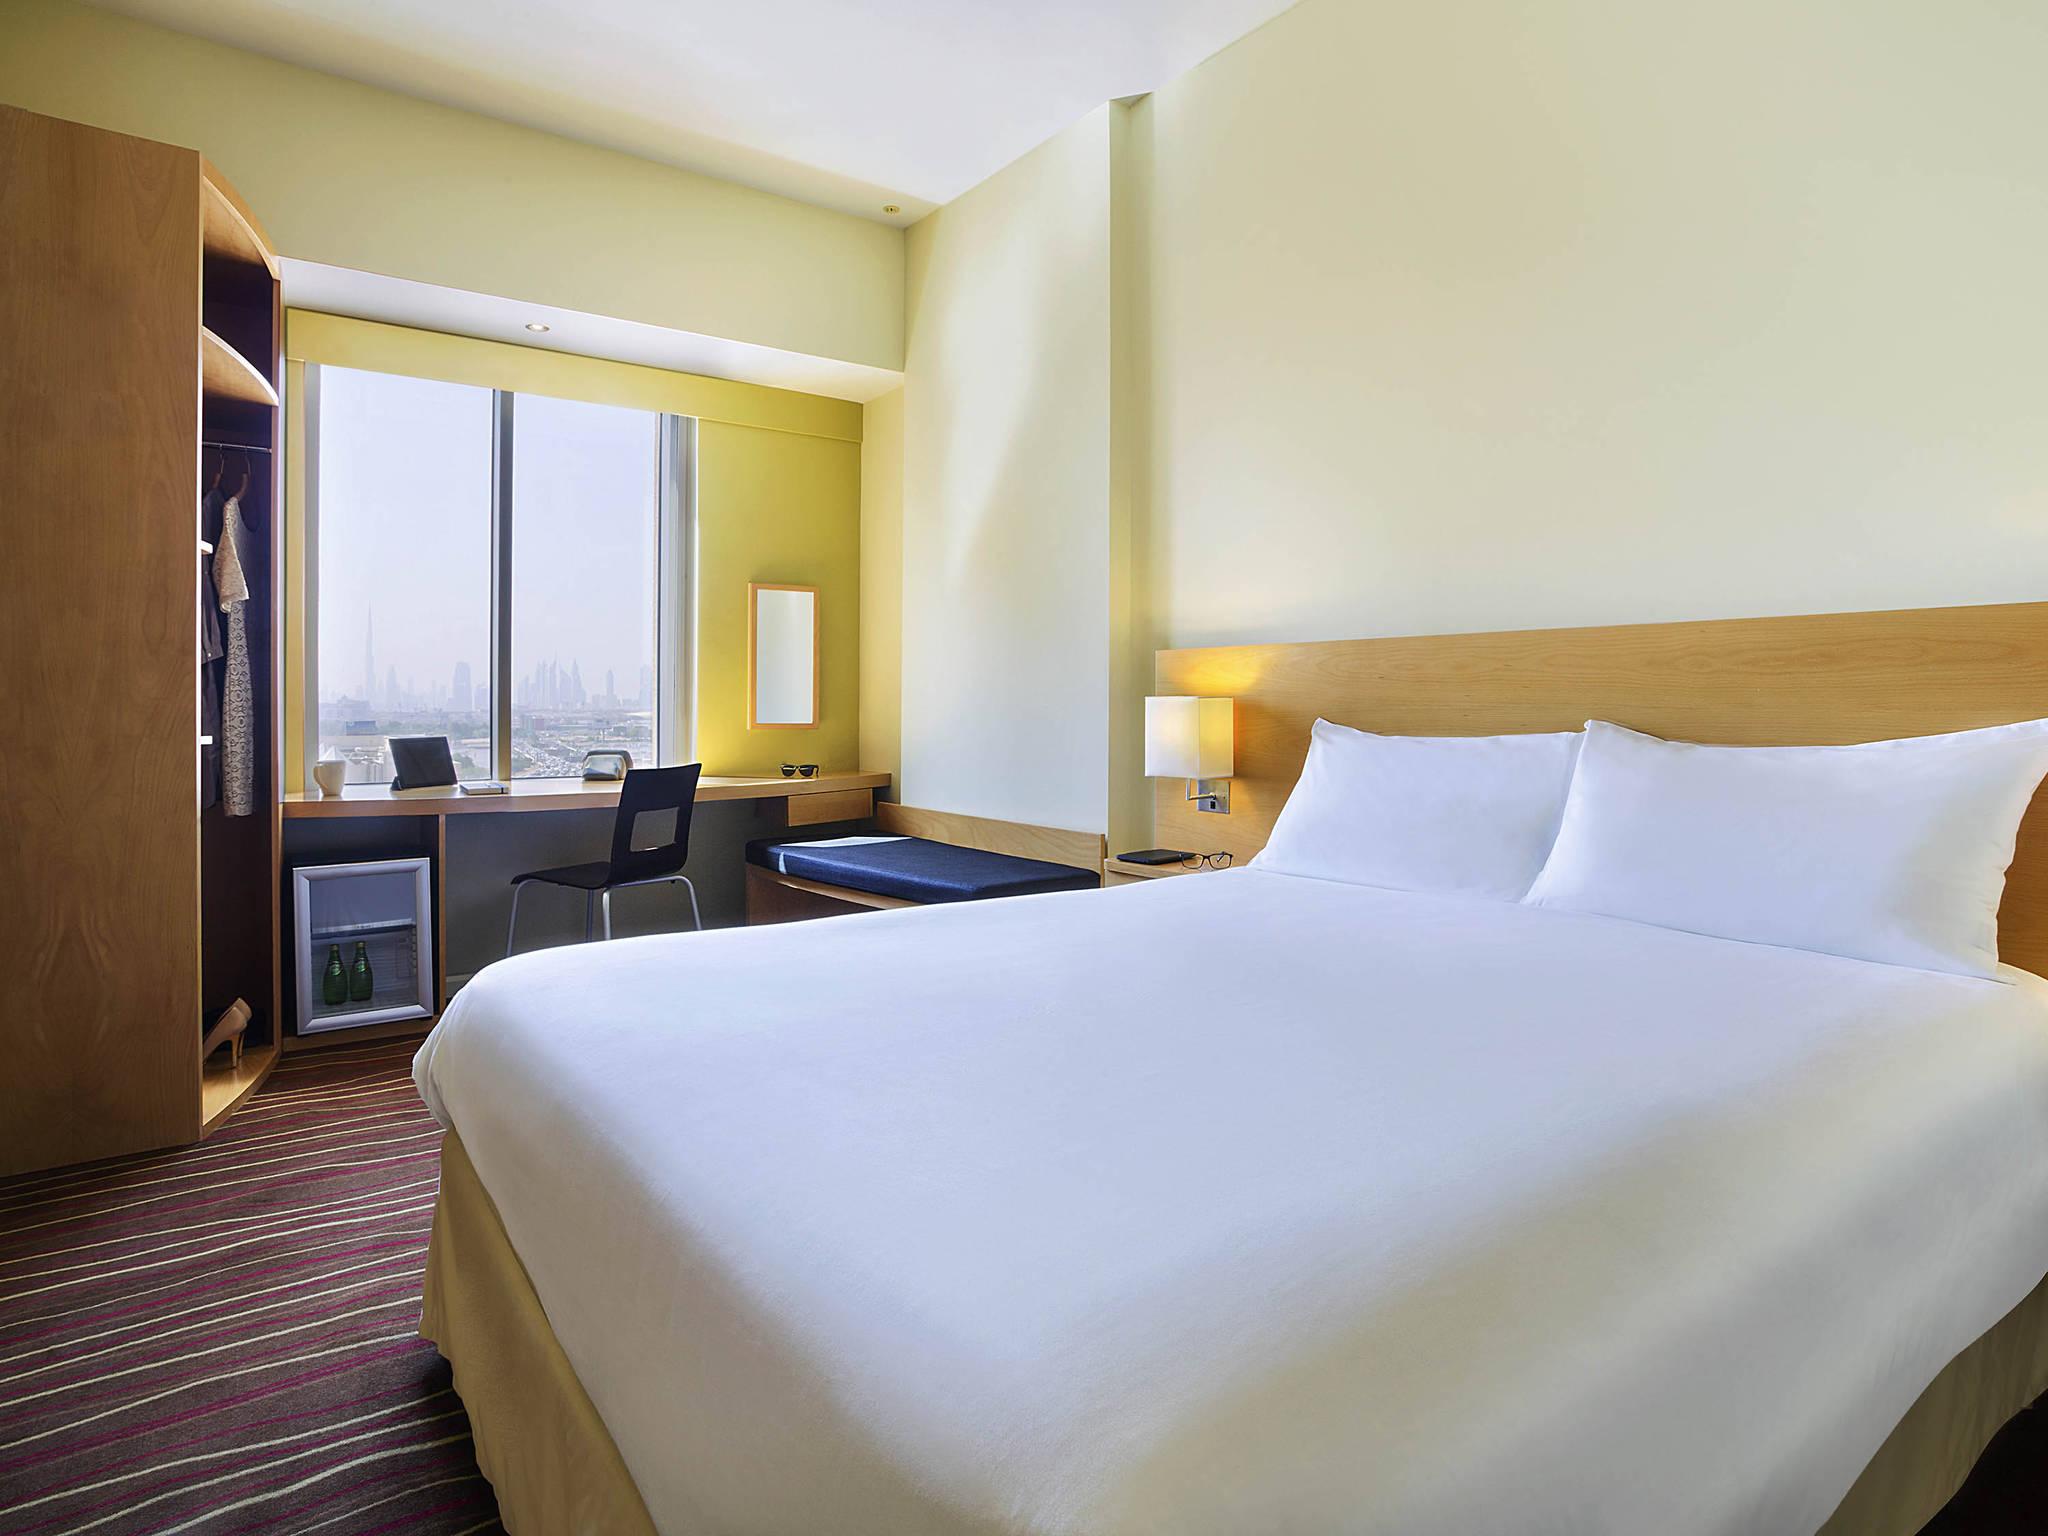 هتل یورک اینترنشنال دبی